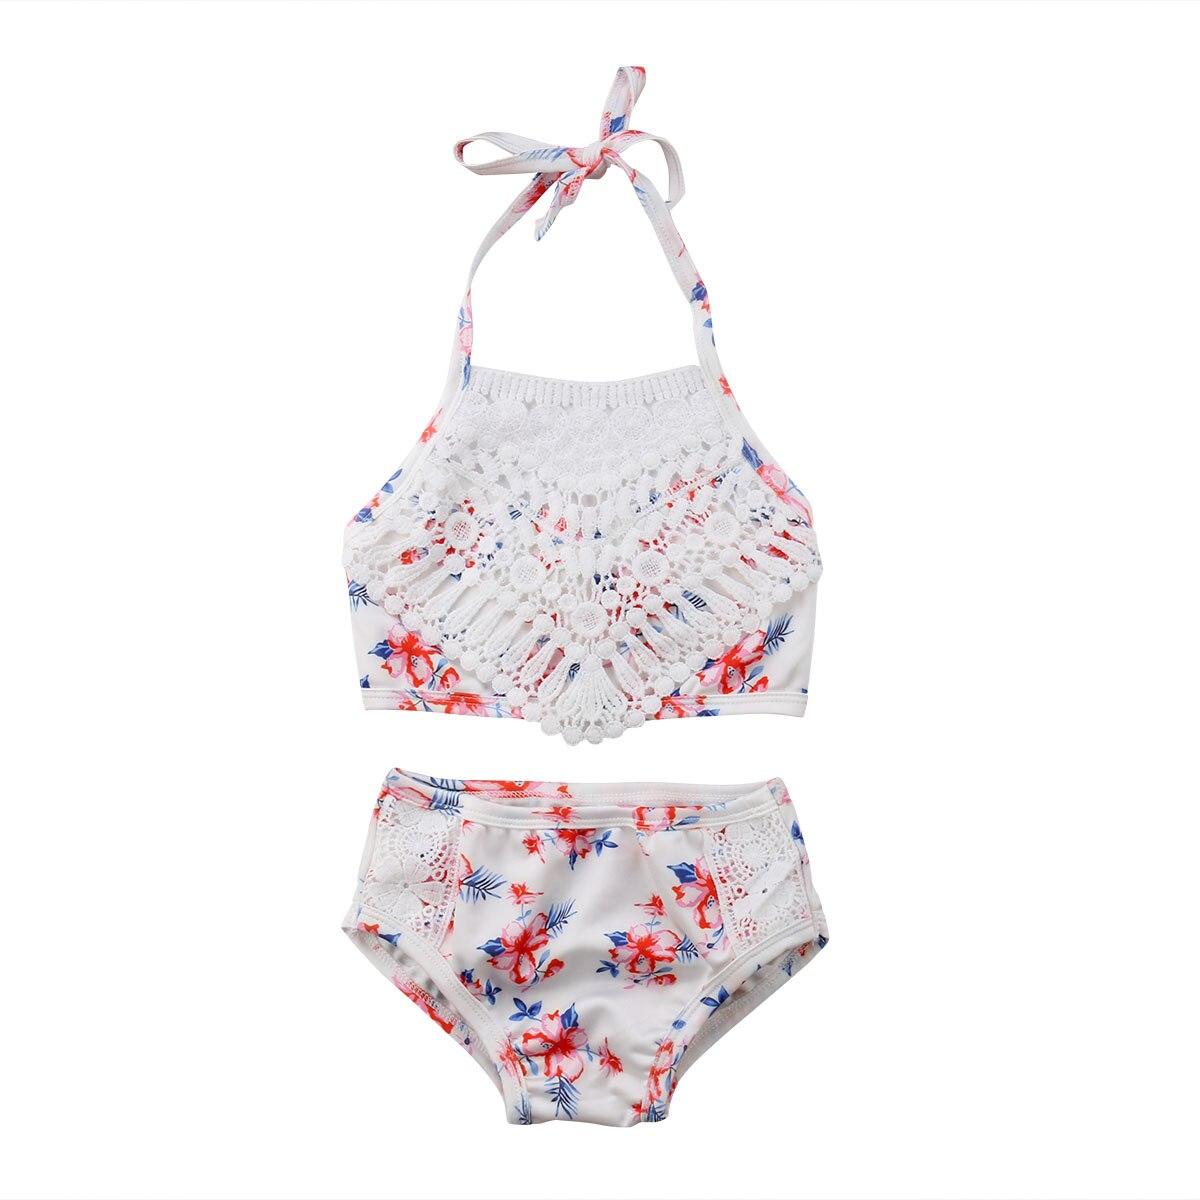 2Pcs Toddler Baby Girl Lace Swimwear Bathing Suit Bikini Outfits Swimsuit Sets Купальник